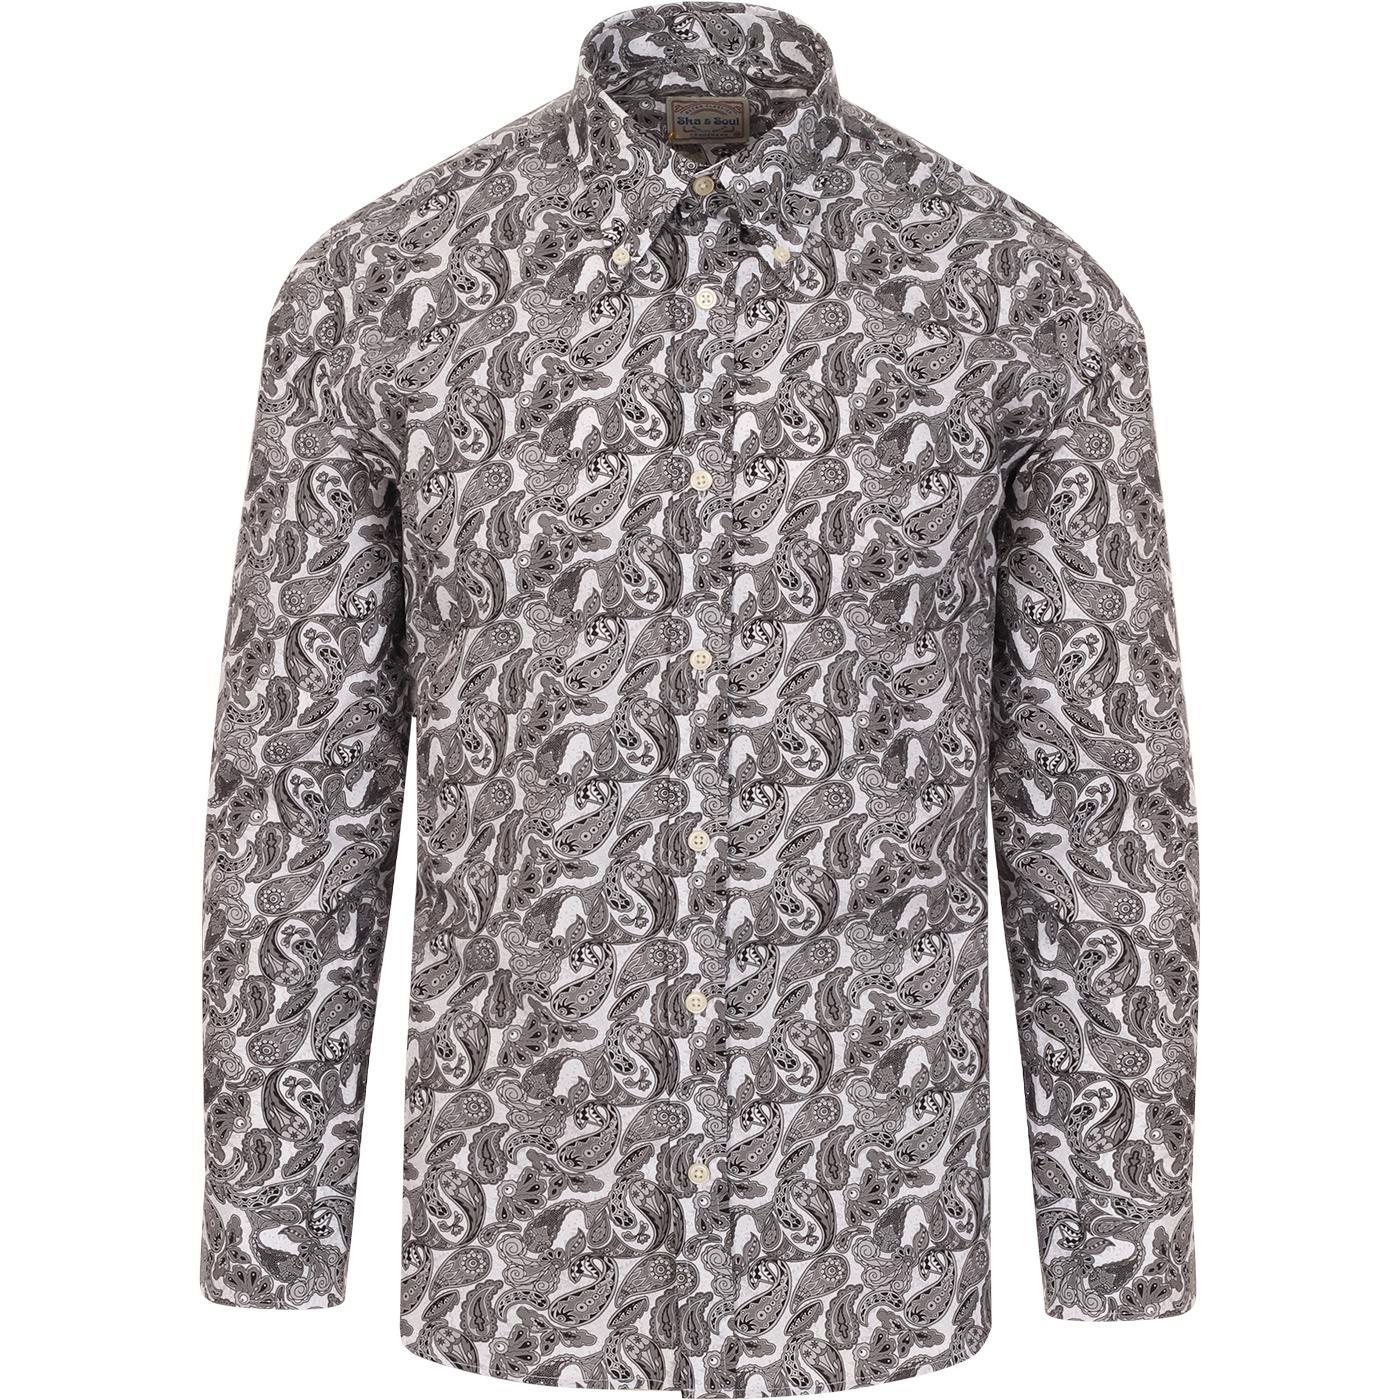 SKA & SOUL 60s Mod Psychedelic Paisley BD Shirt G